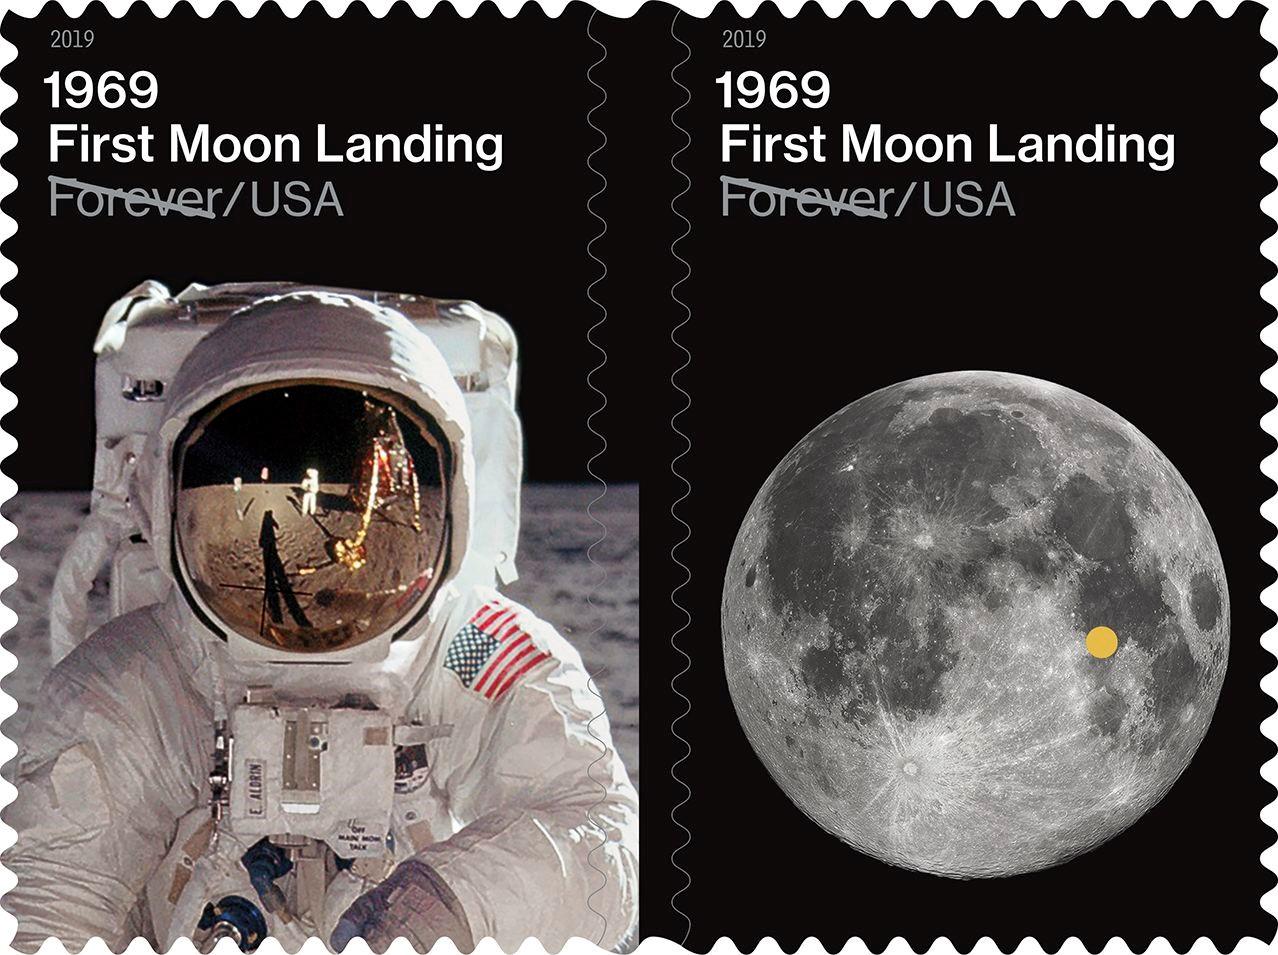 USPS-moon-landing-stamps.jpg